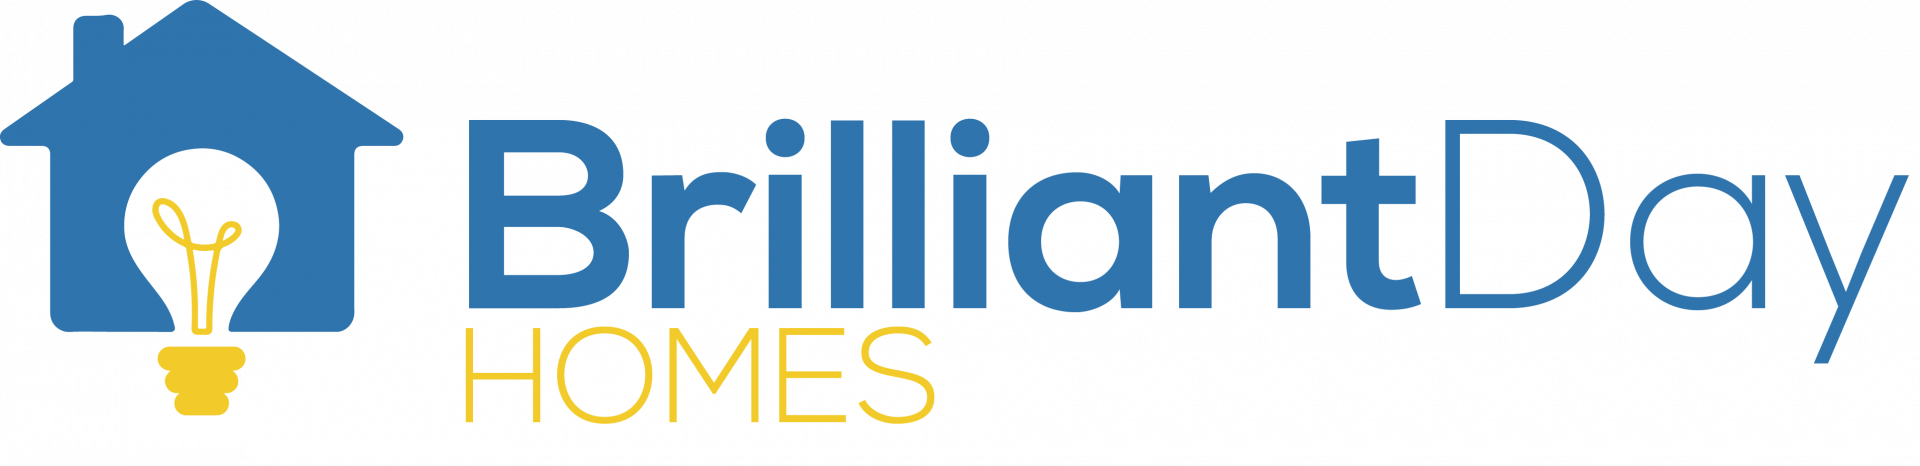 Brilliant Day Homes  logo